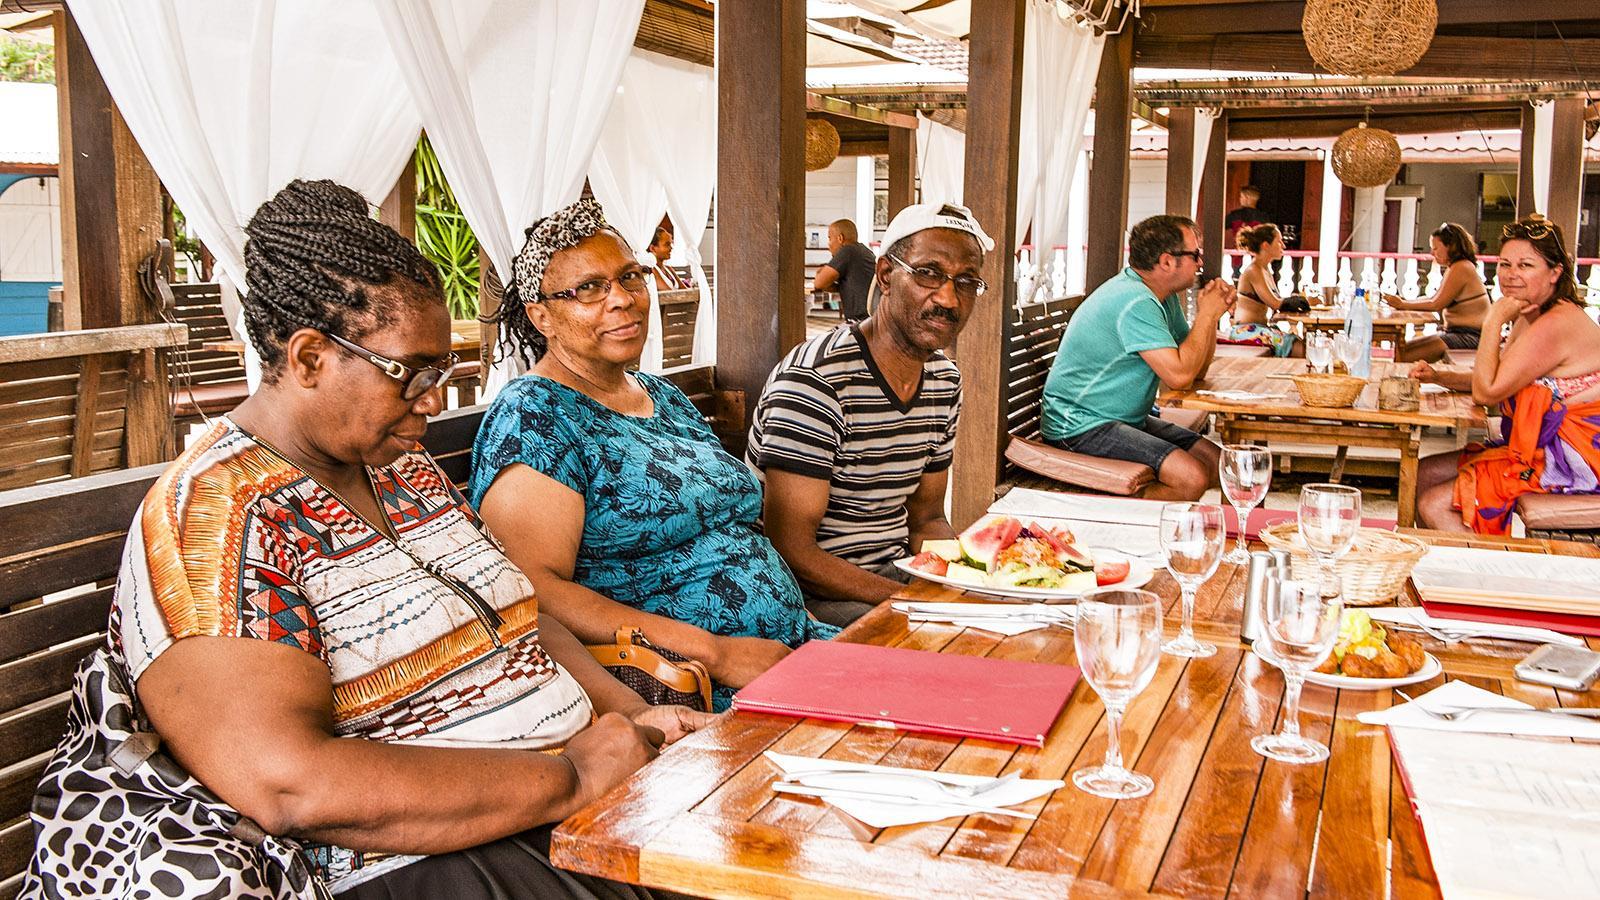 Strandbars auf Martinique: Ti Sable bei Les Anses d'Arlet. Foto: Hilke Maunder